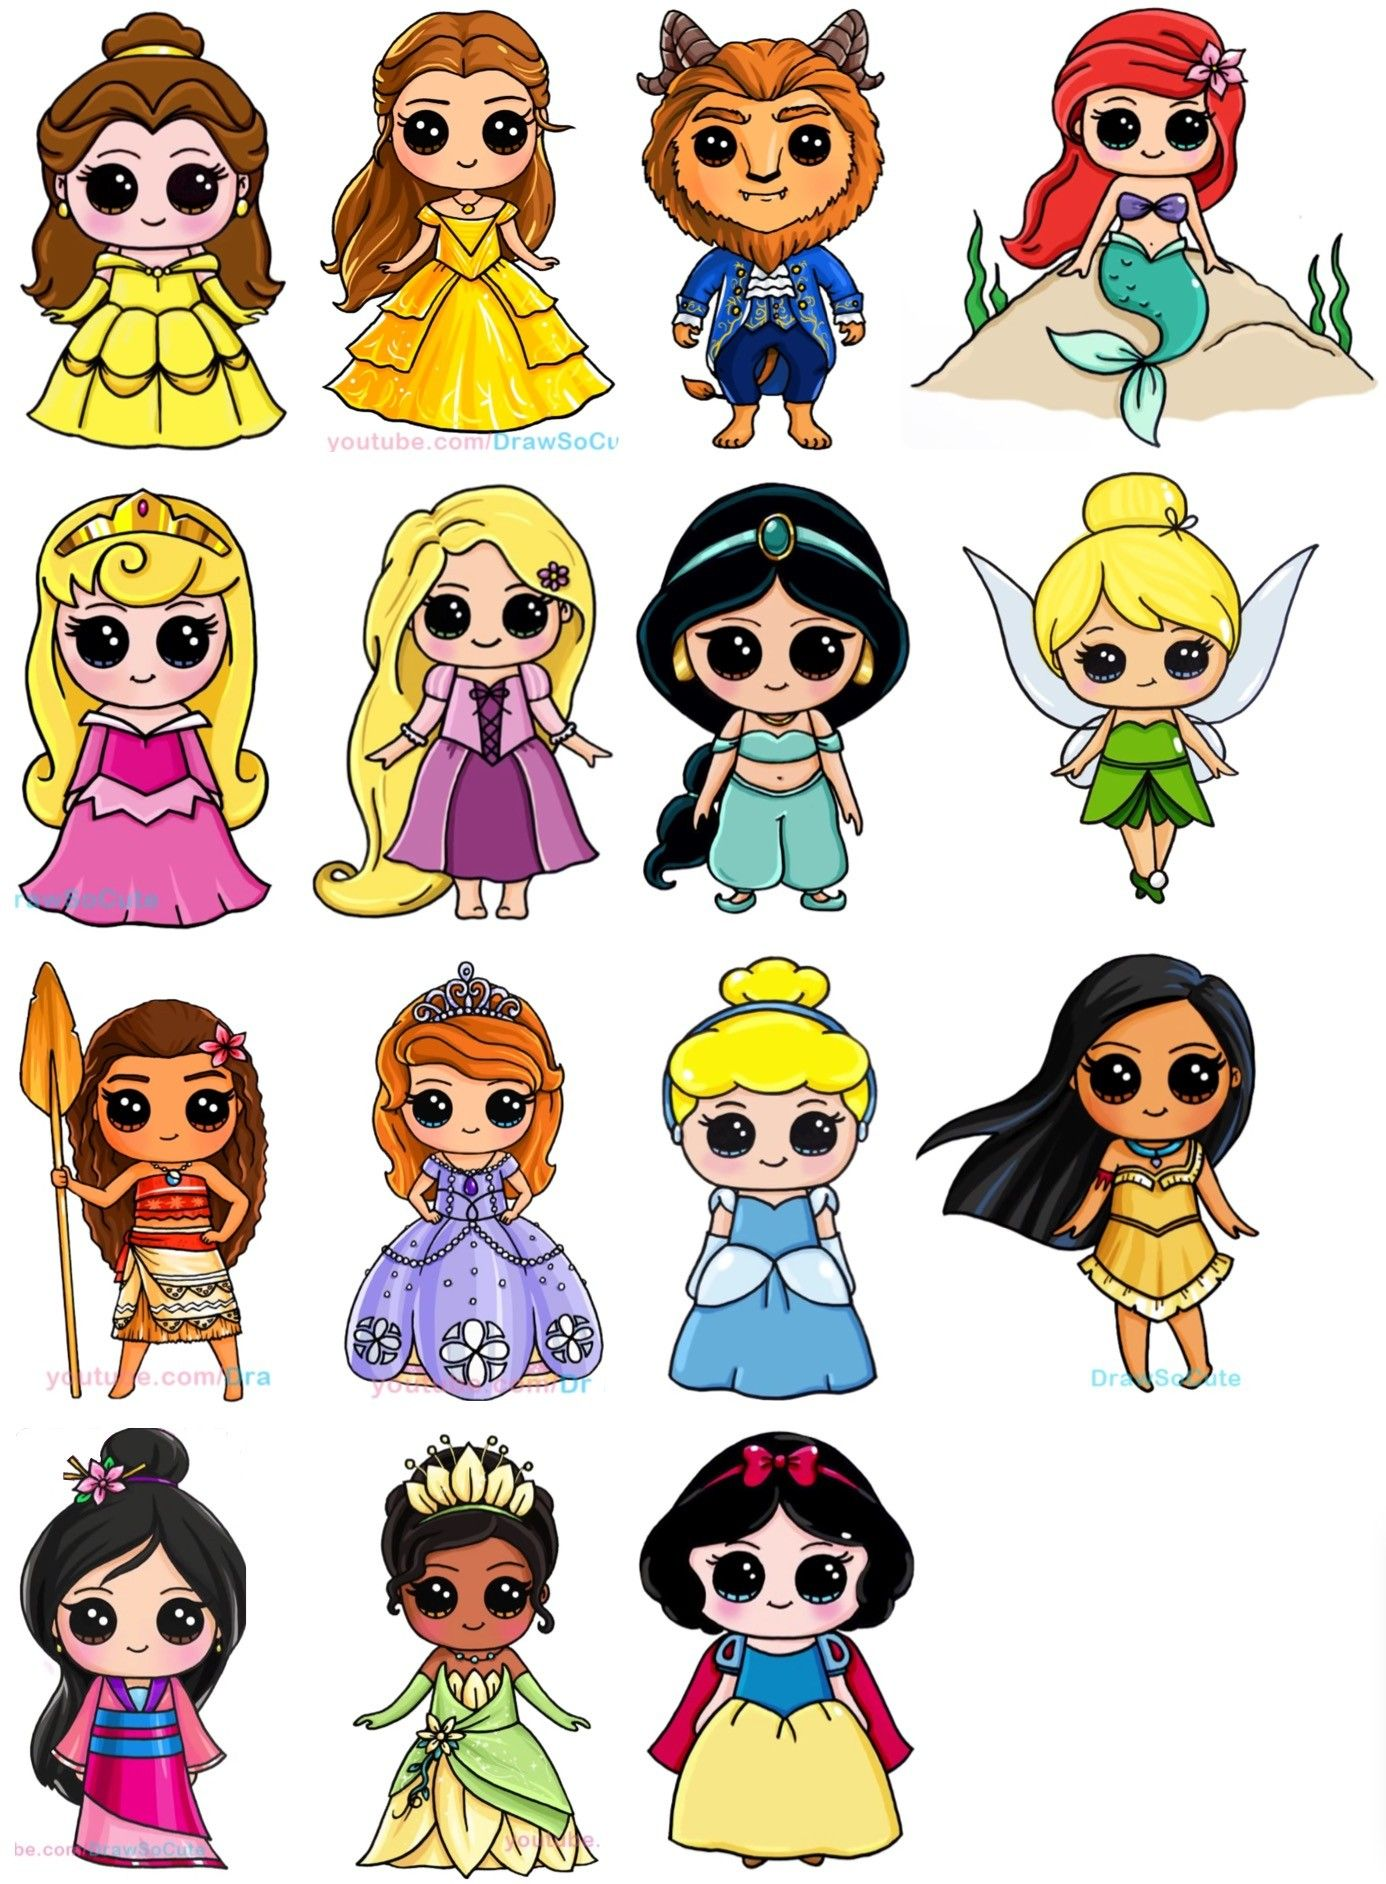 Disney Painting Disegni Disney Disegni Principessa Disney